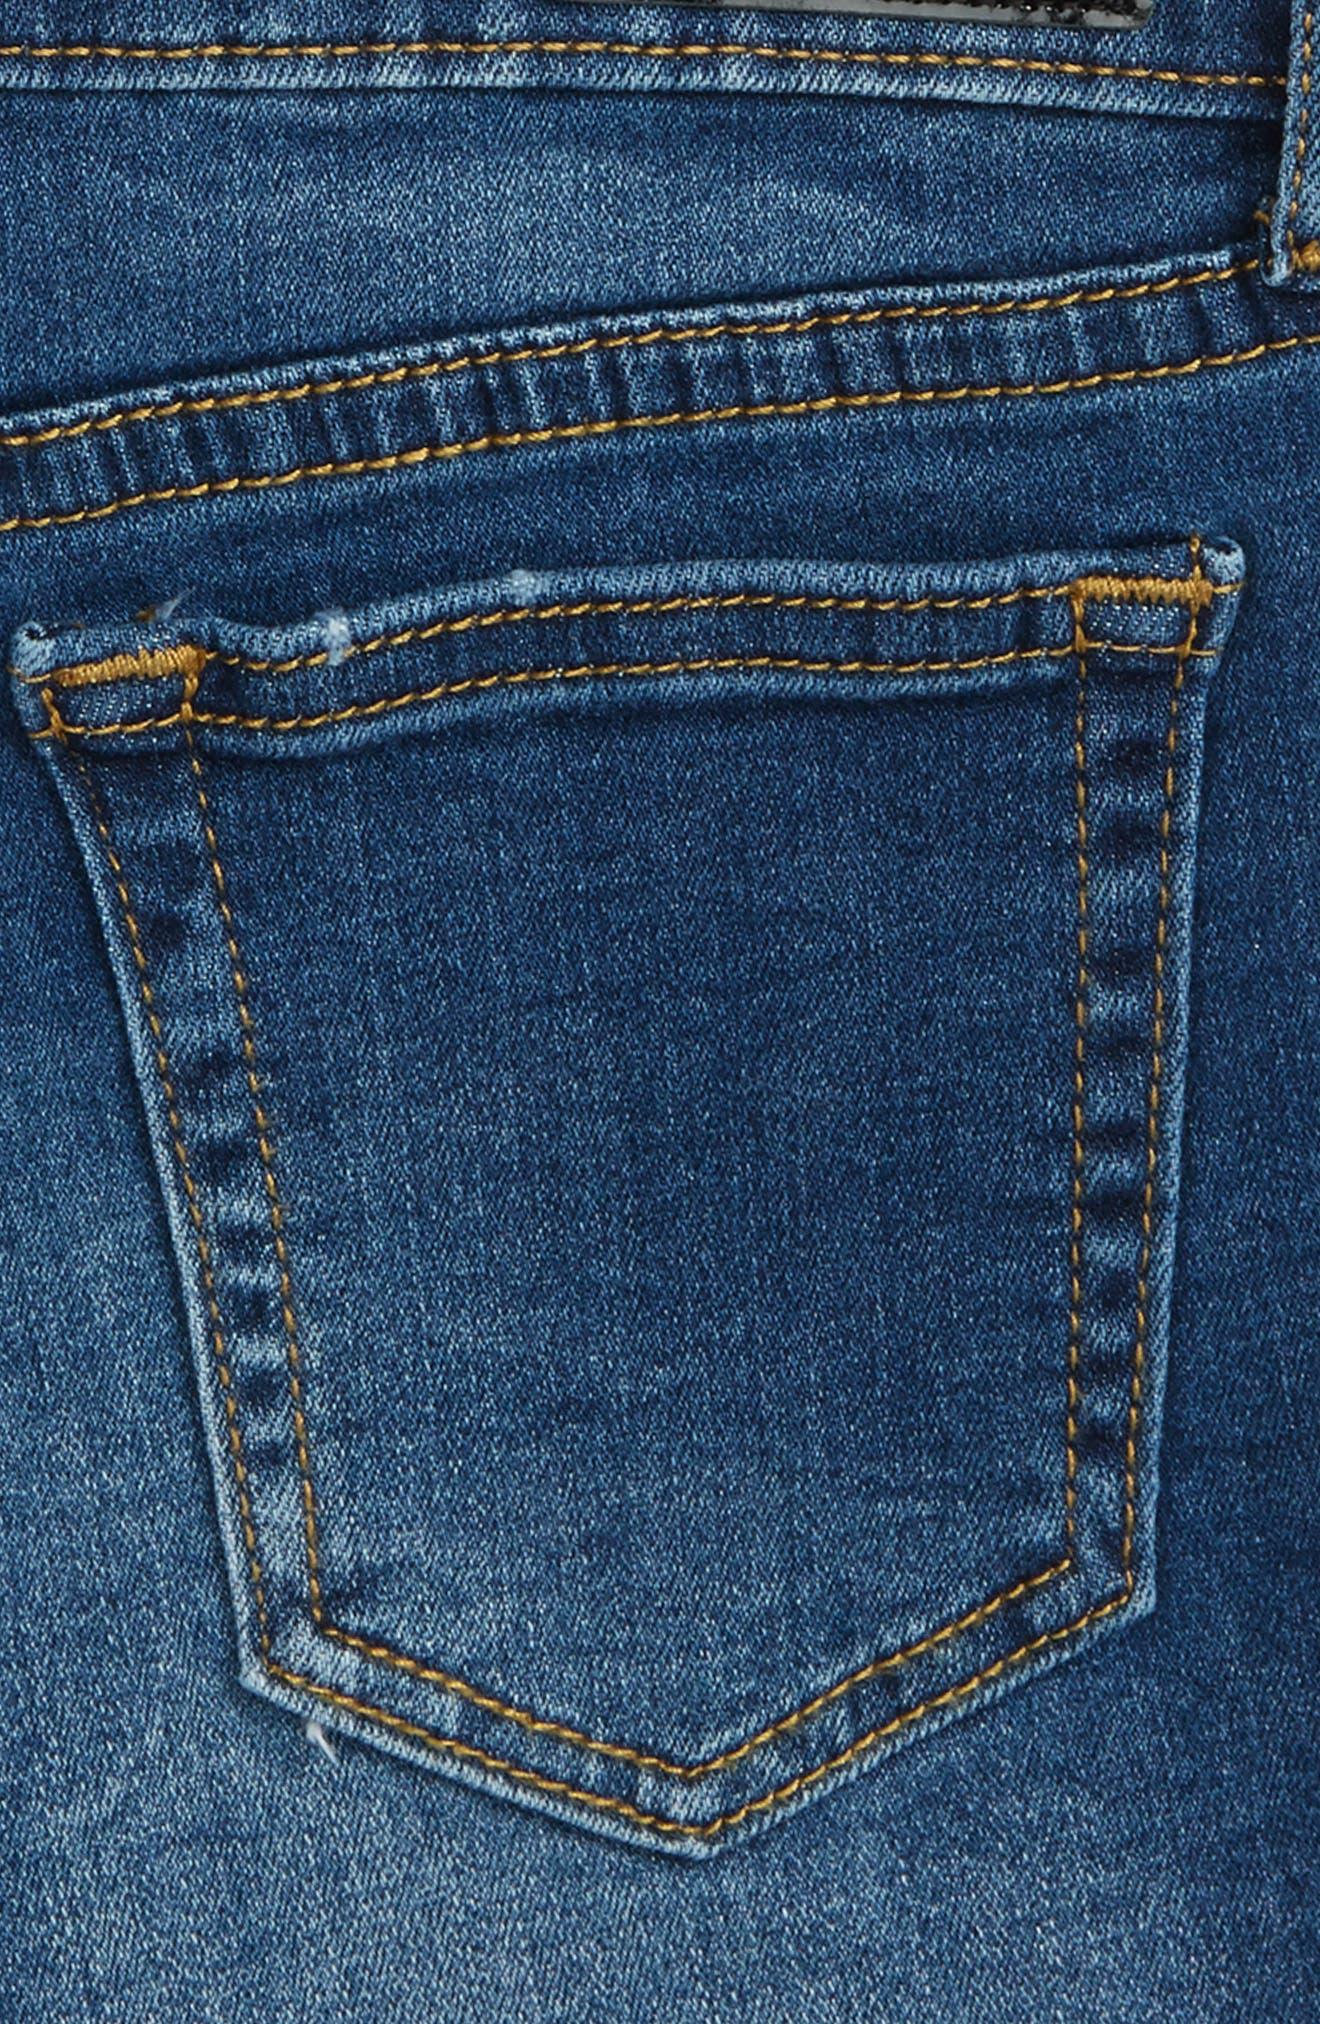 Alternate Image 3  - ag adriano goldschmied kids The Bruna Cutoff Denim Shorts (Big Girls)